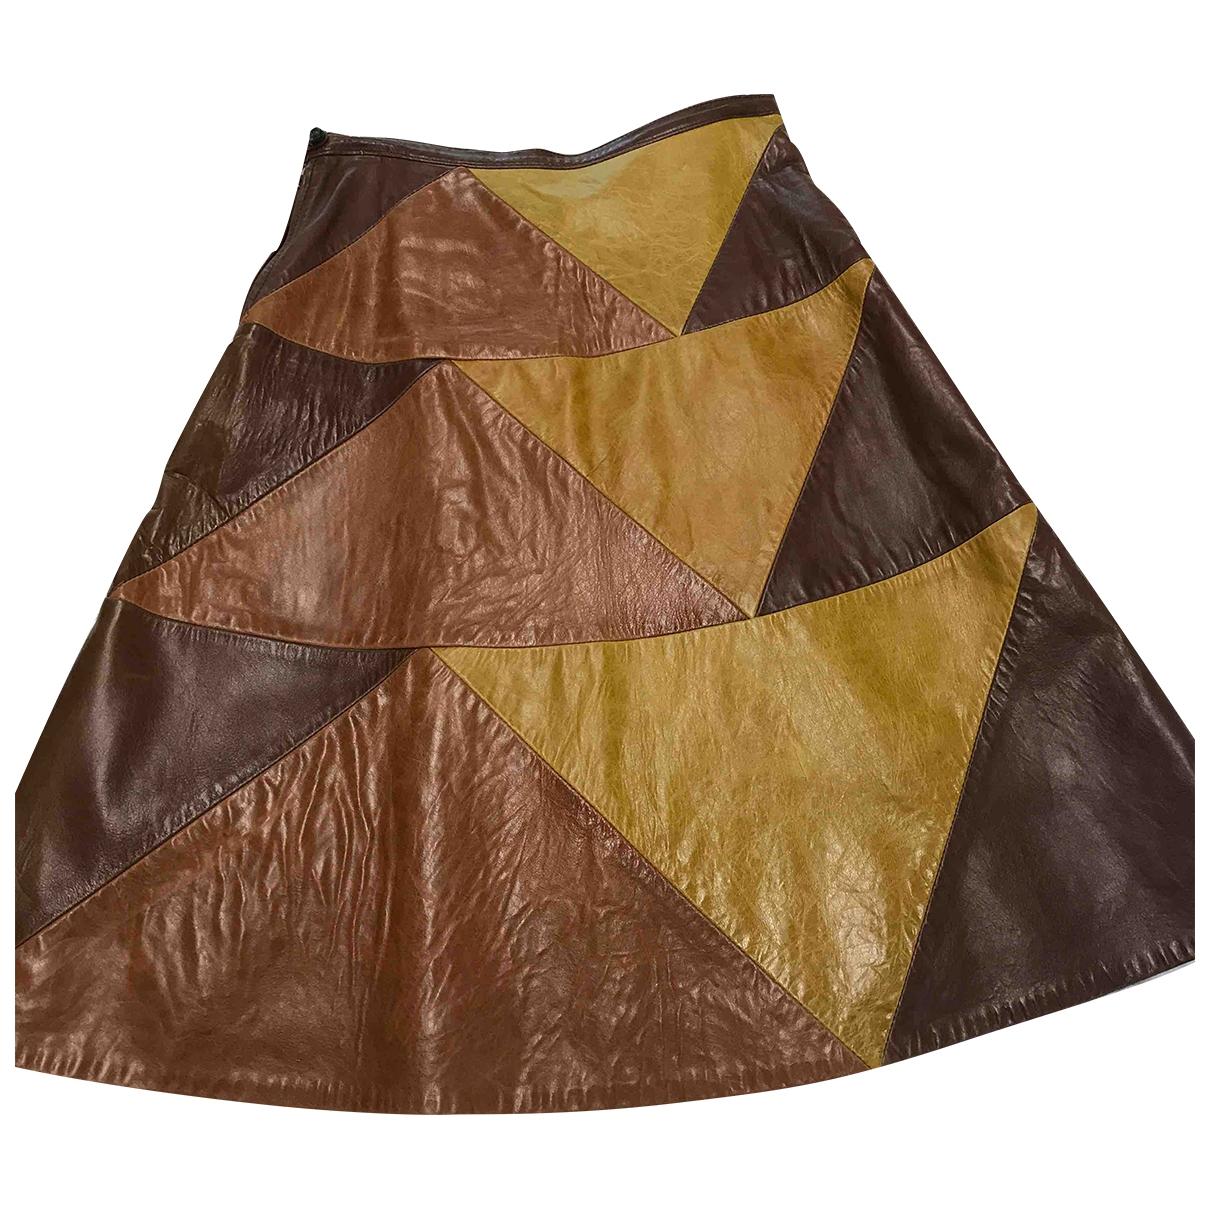 Bernhard Willhelm \N Leather skirt for Women 38 IT